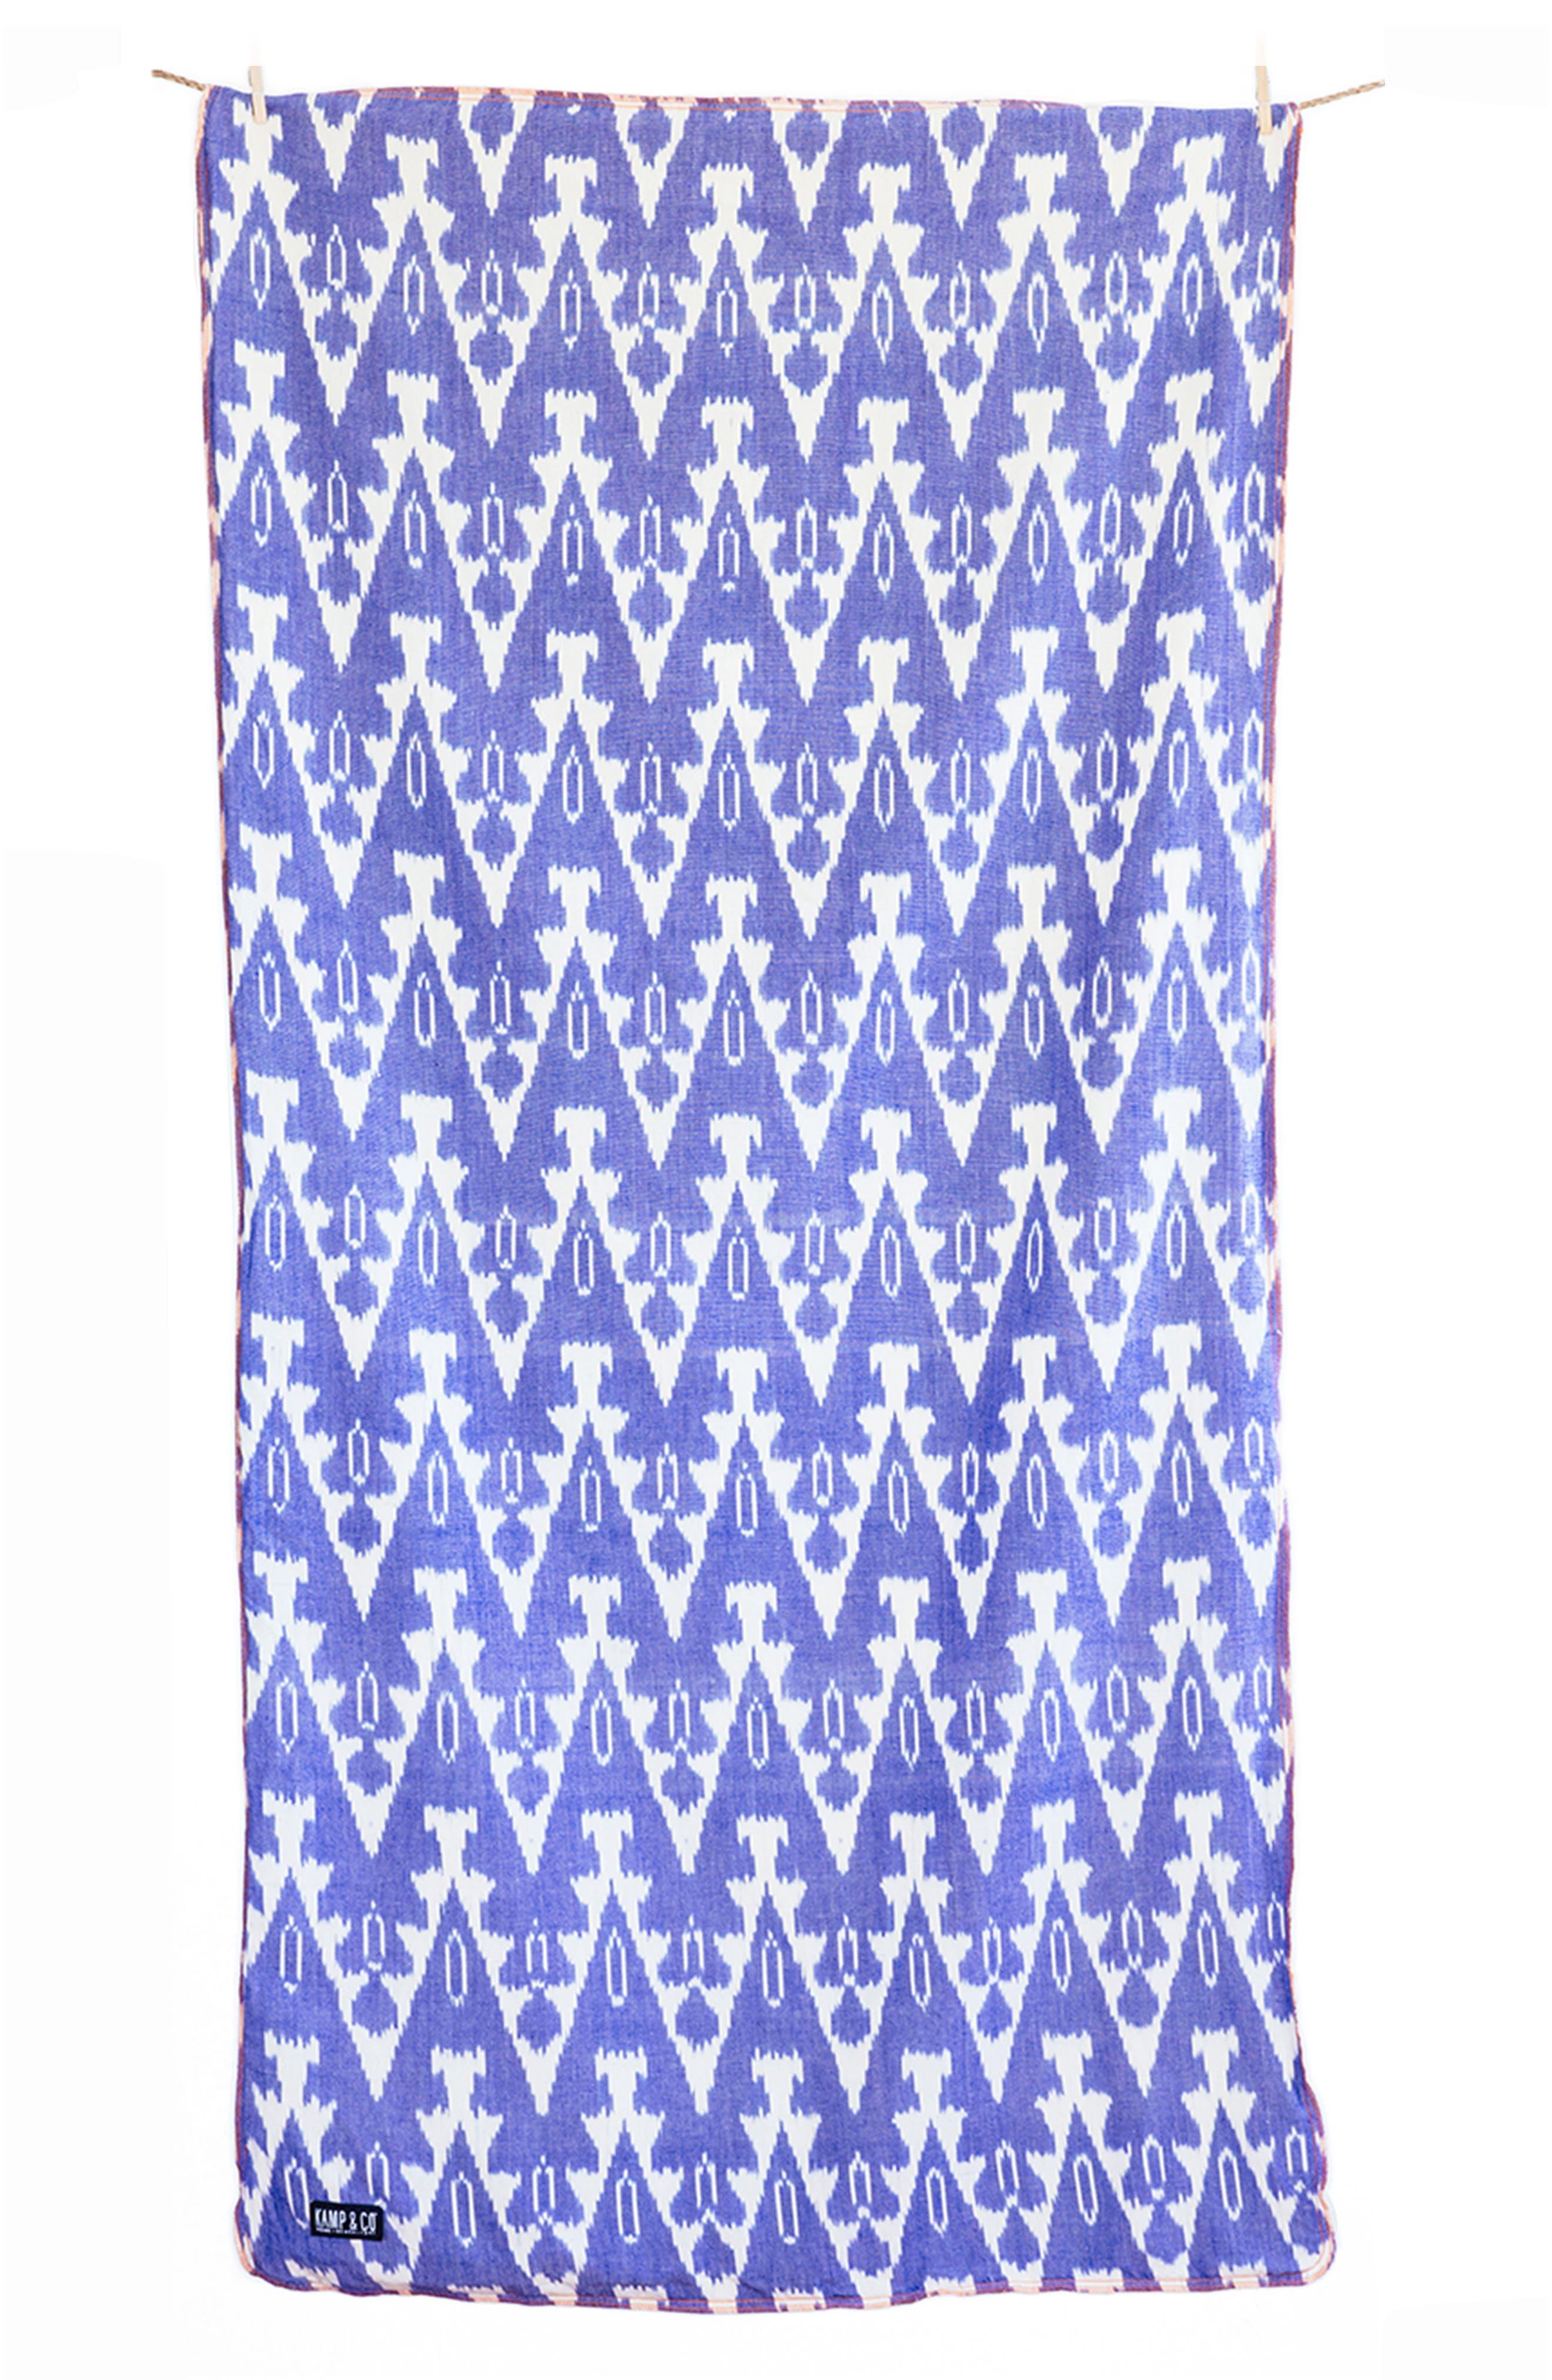 Kamp & Co. Torrey Kamp Towel,                             Main thumbnail 1, color,                             400